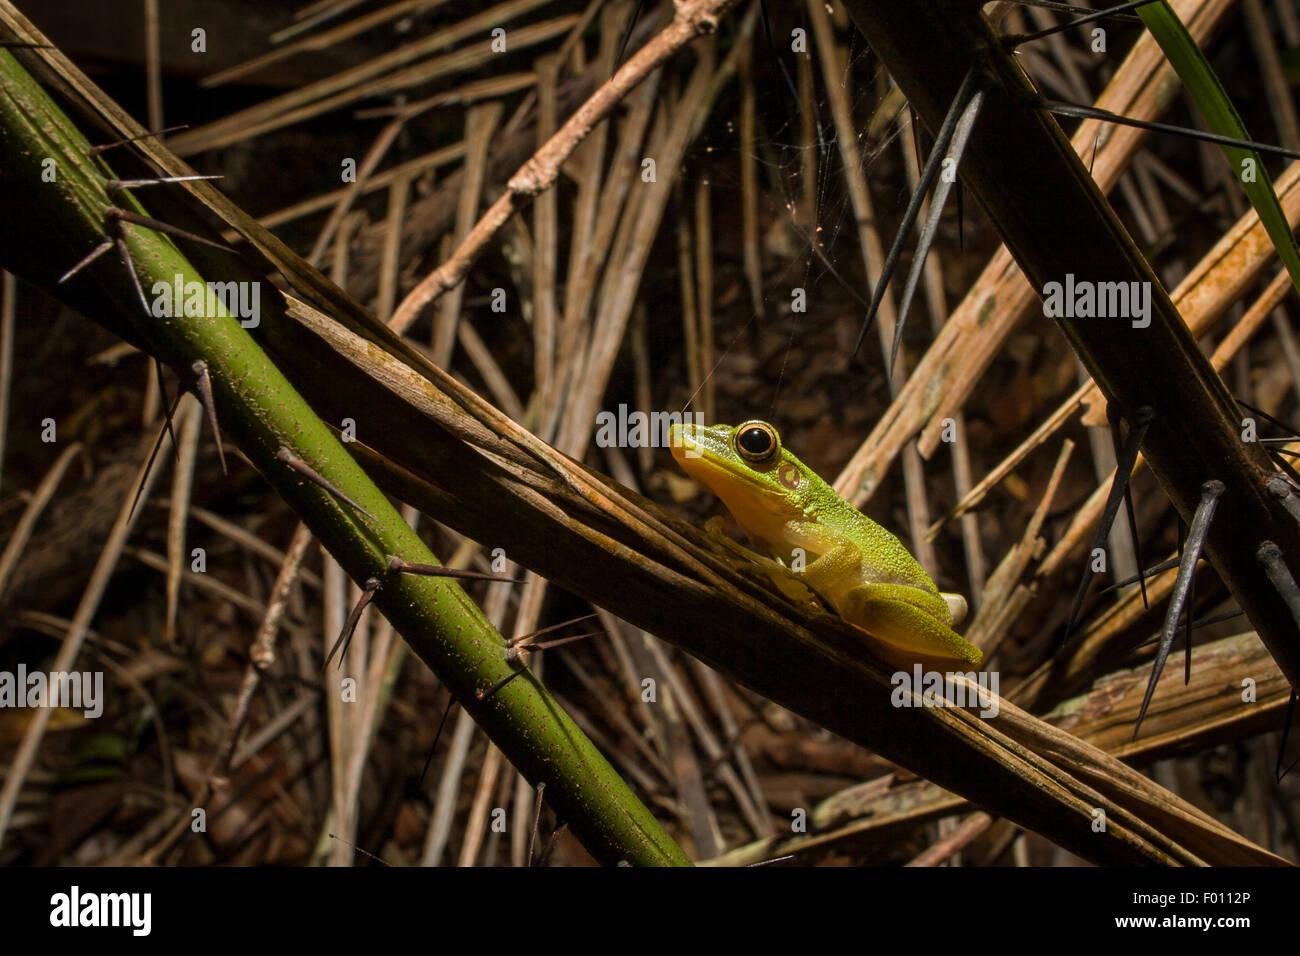 White-lipped frog (Hylarana raniceps) on a thorny branch. - Stock Image